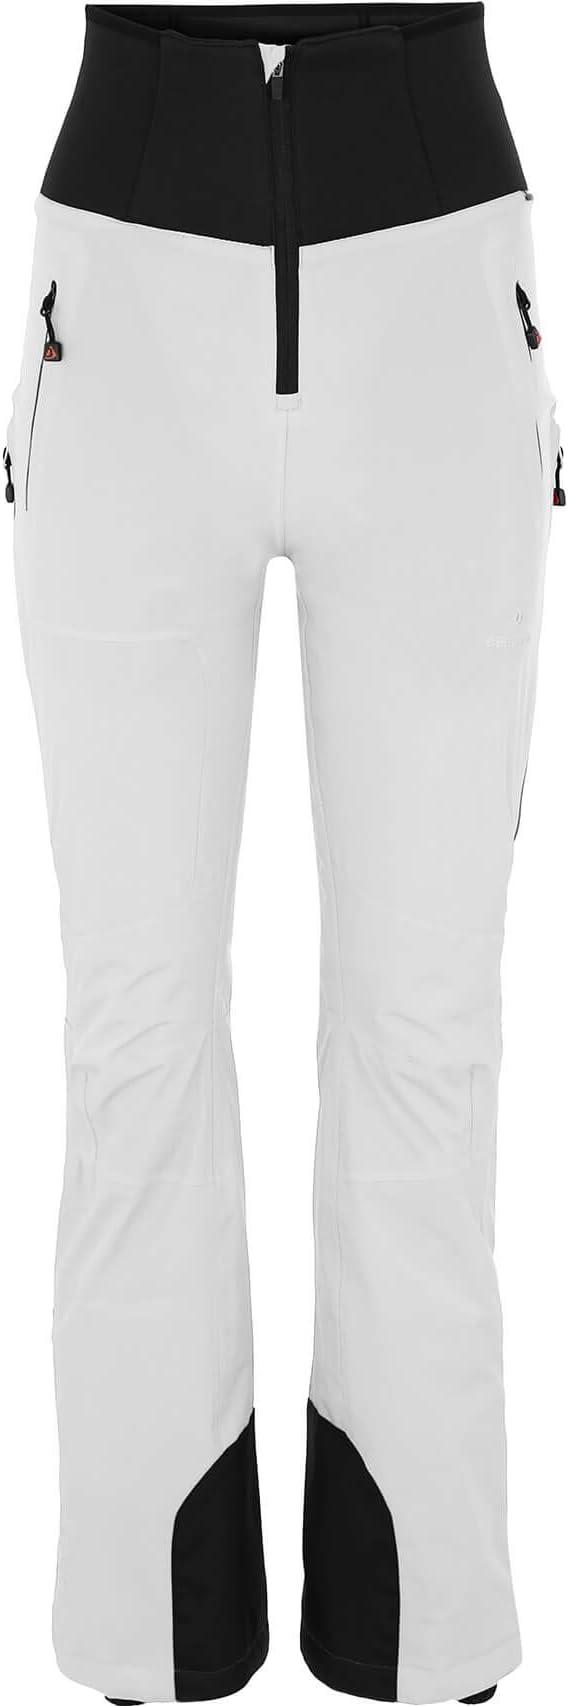 Bergson Damen Skihose Ice Light 600 Slim fit Damen 34 White